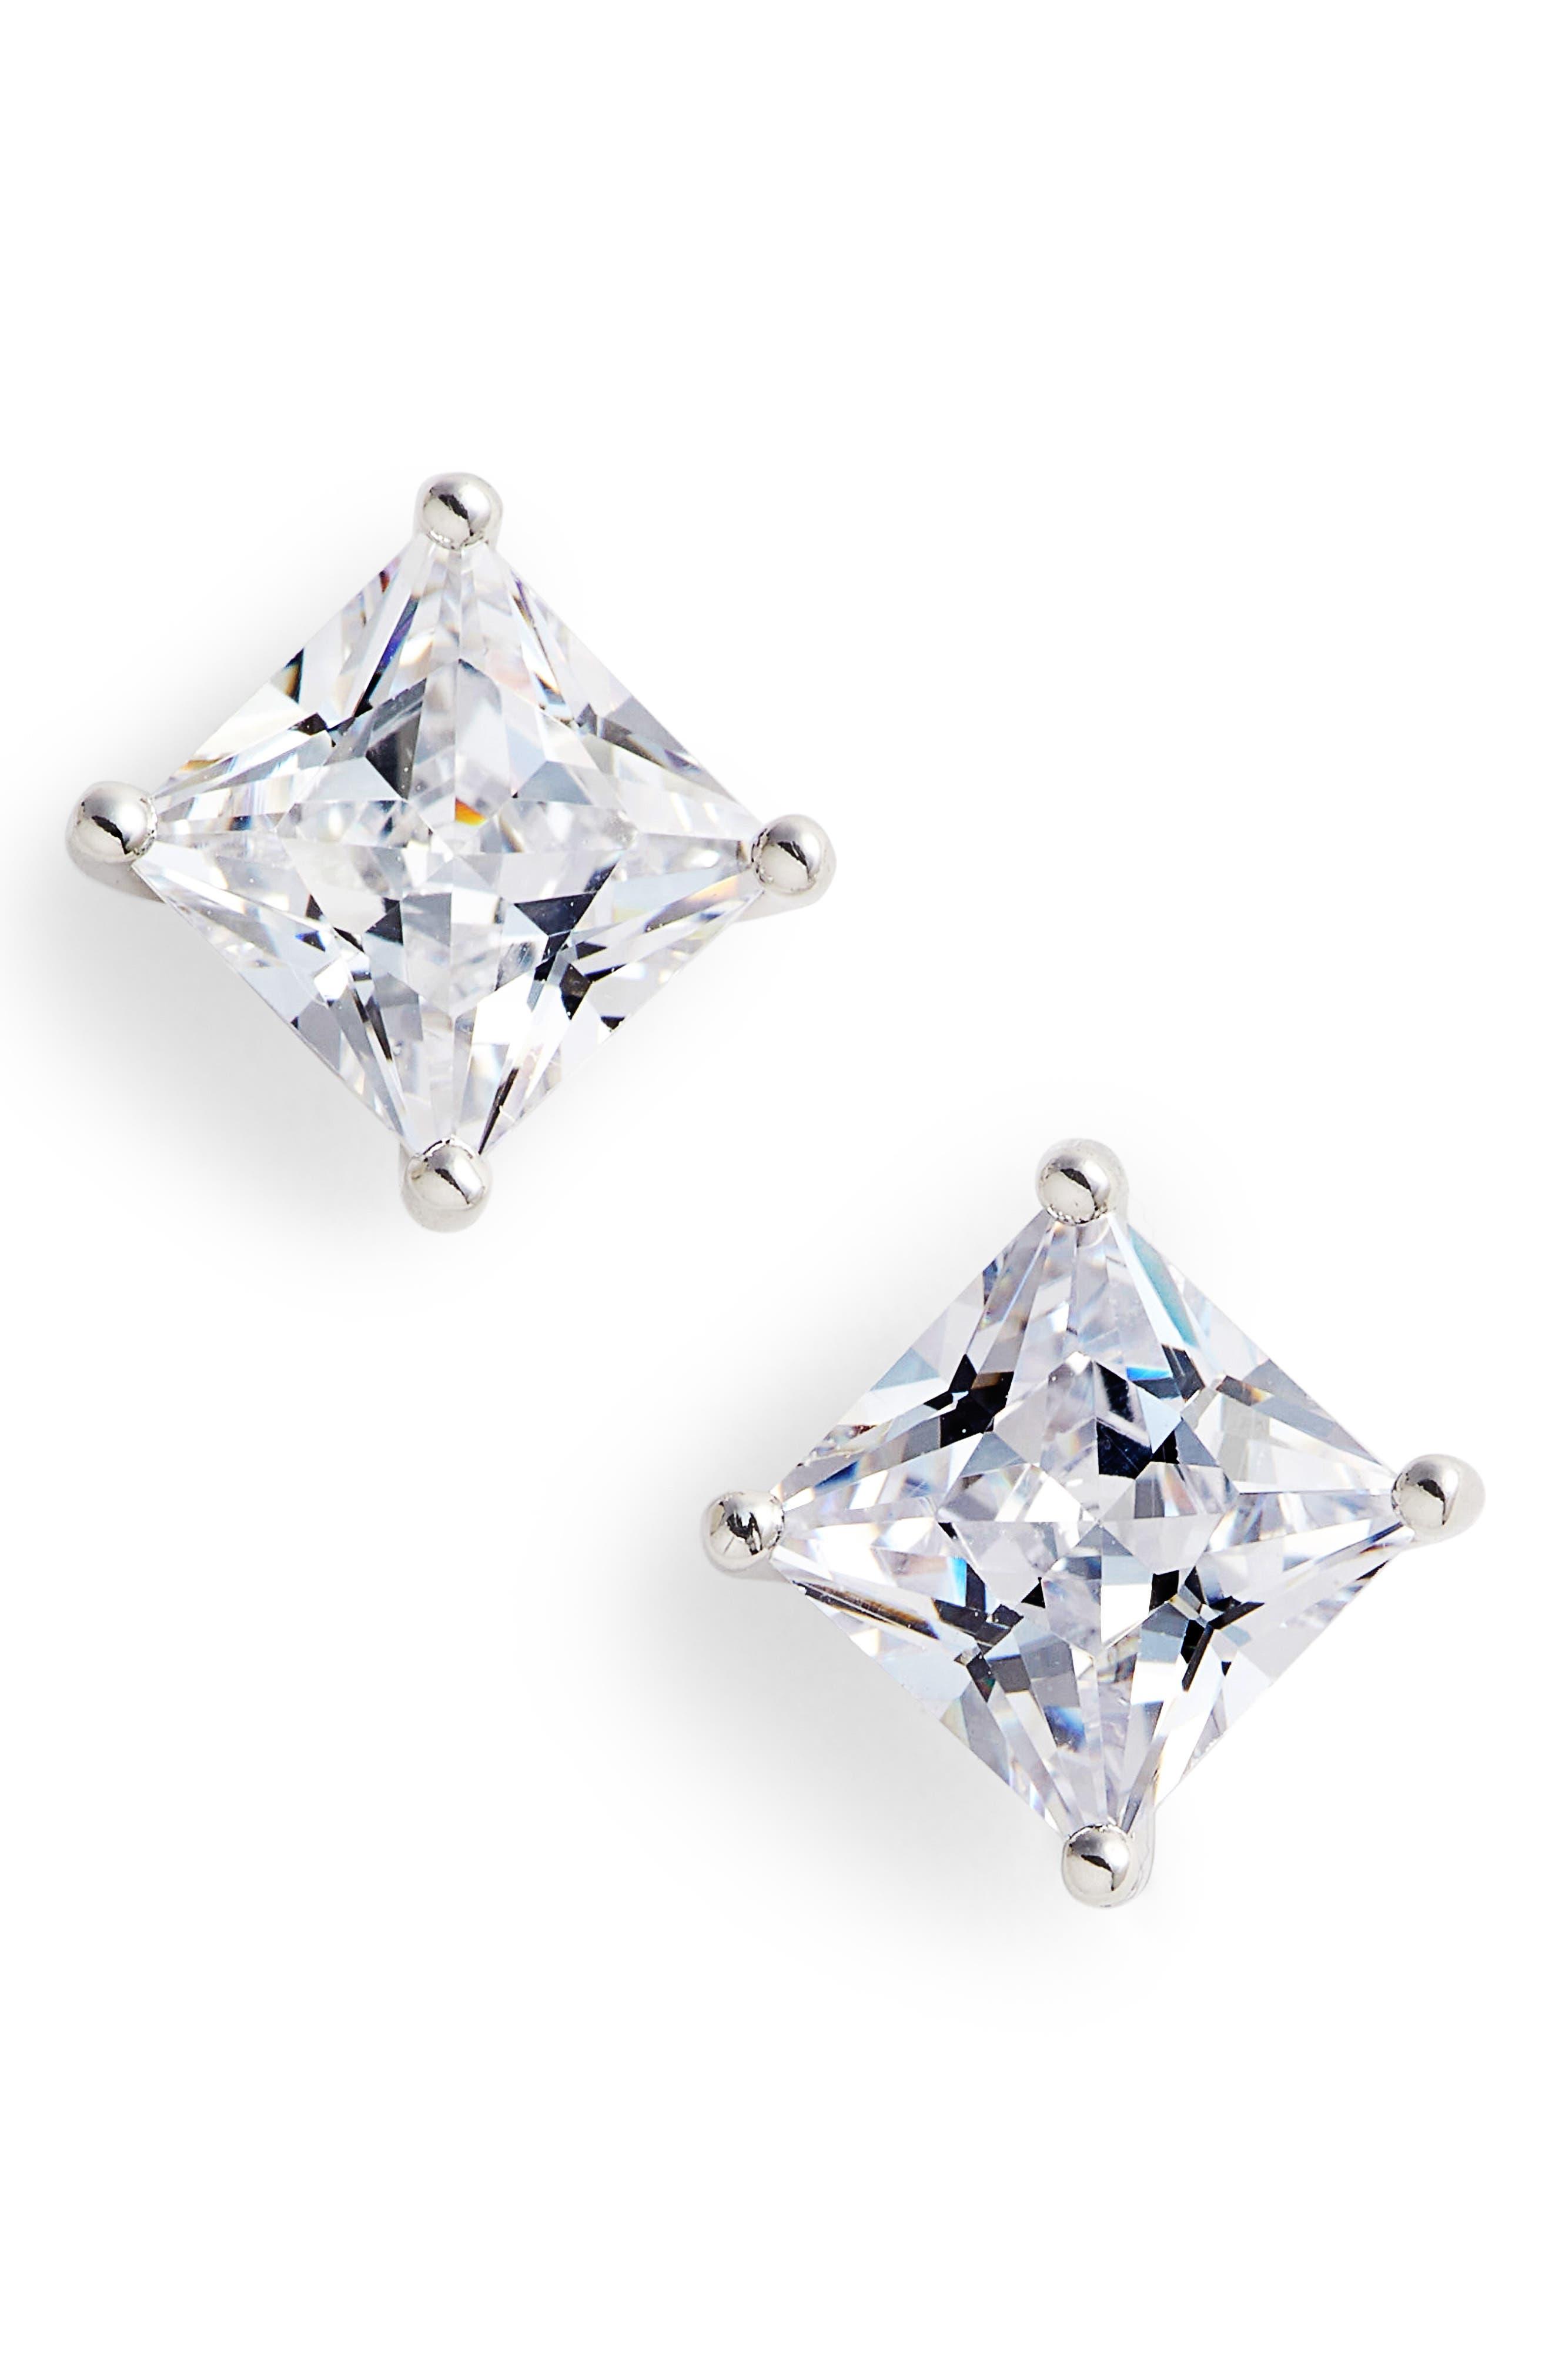 4ct tw Princess Cut Cubic Zirconia Stud Earrings,                         Main,                         color, Platinum